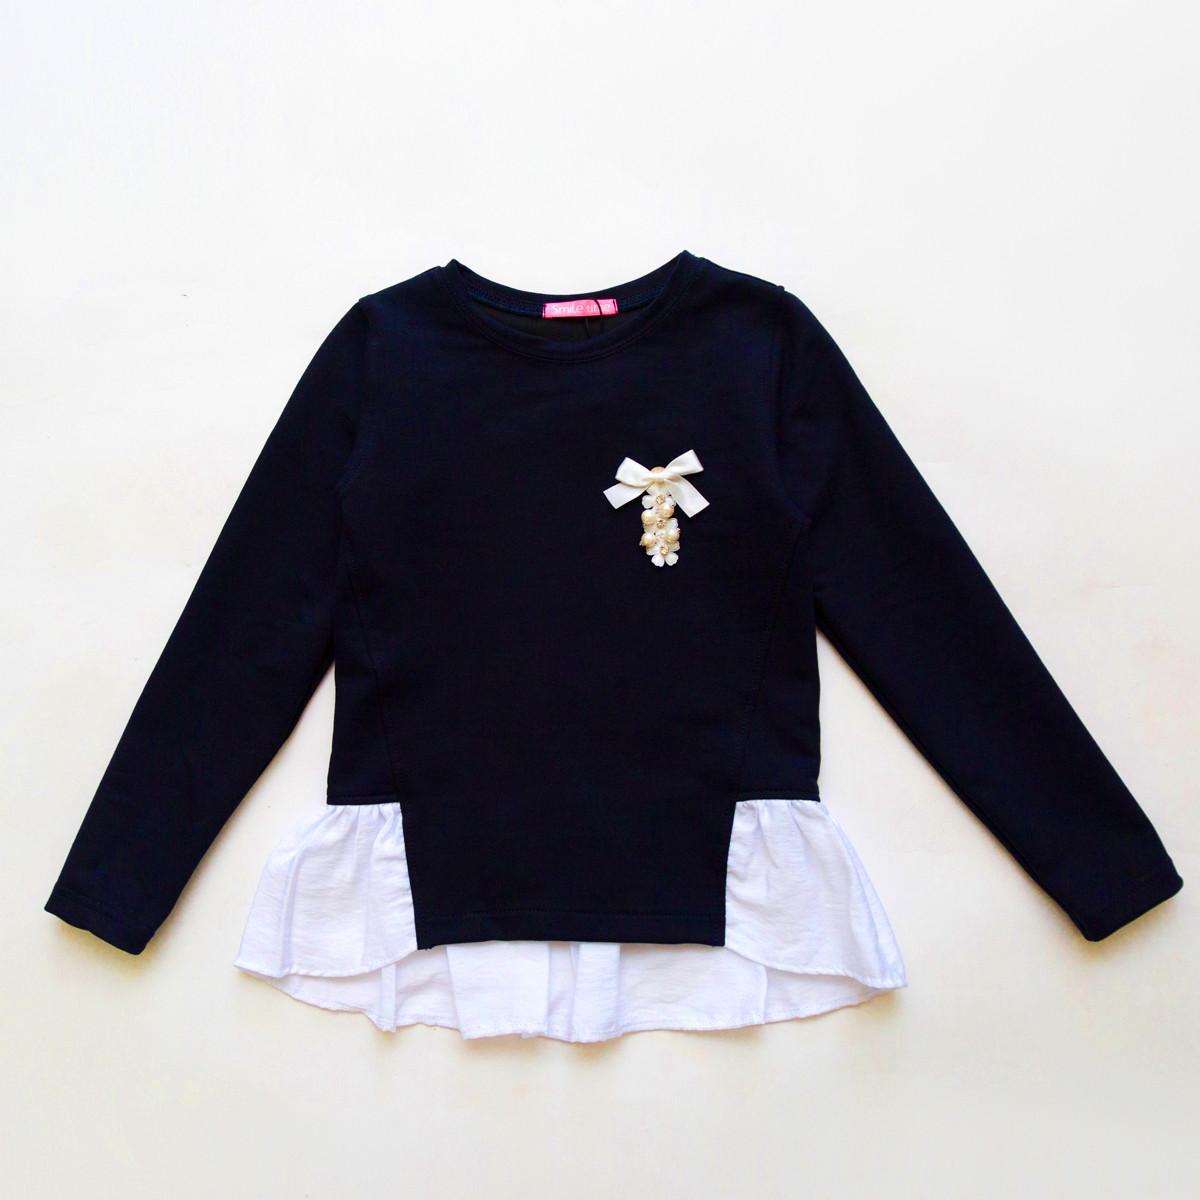 Кофта для девочки SmileTime Schoolgirl, темно-синий с белым